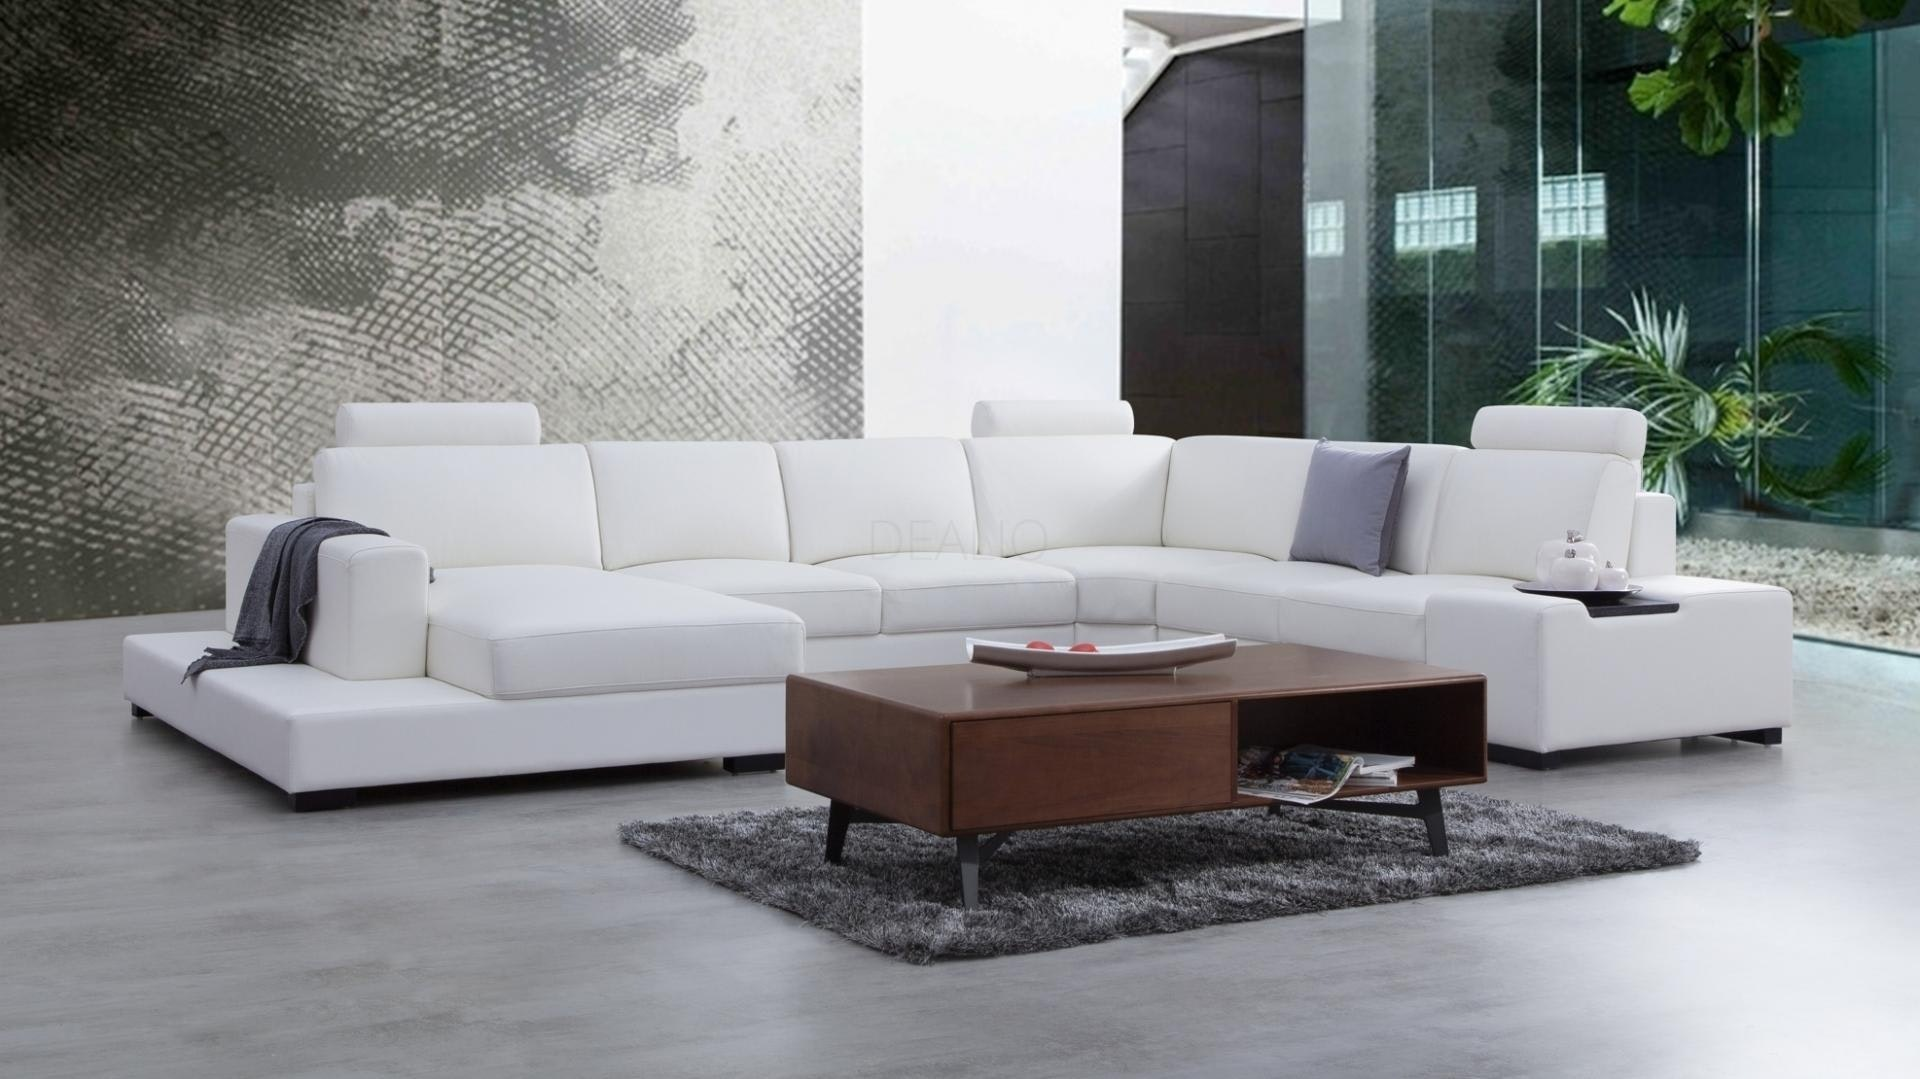 Hollywood Leather Modular Lounge Option A Lounge Life